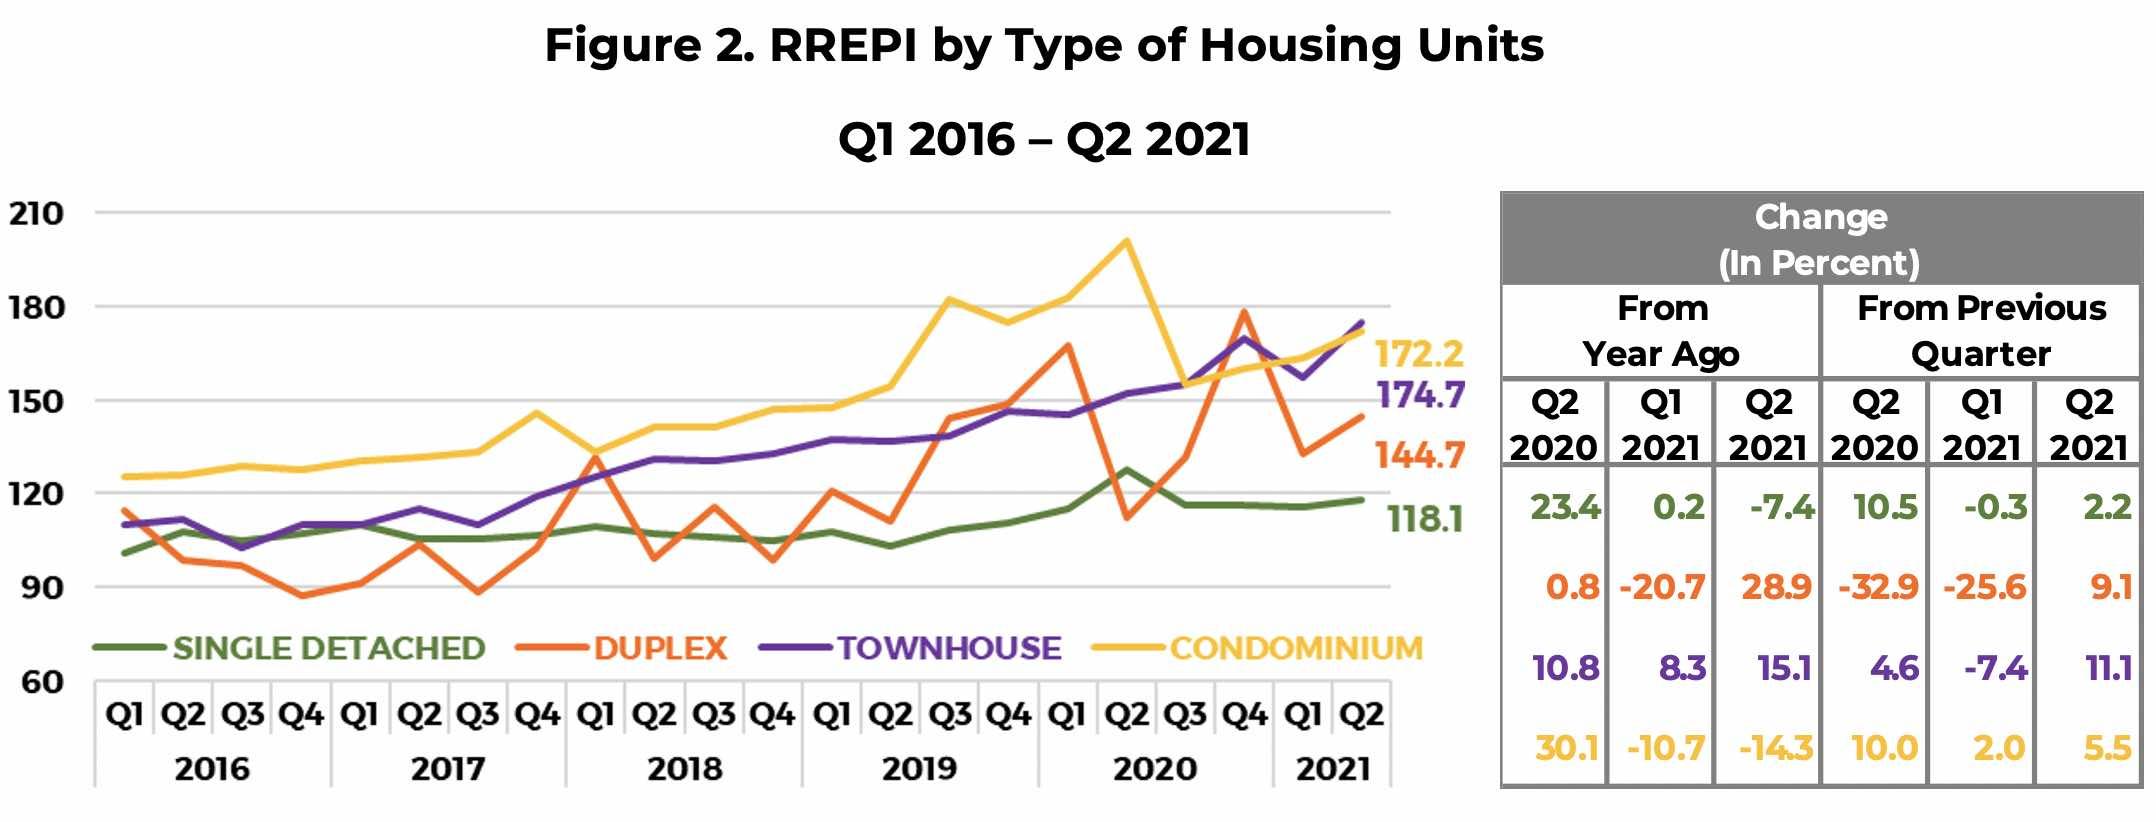 Q2 2021 RREPI Figure2.jpg